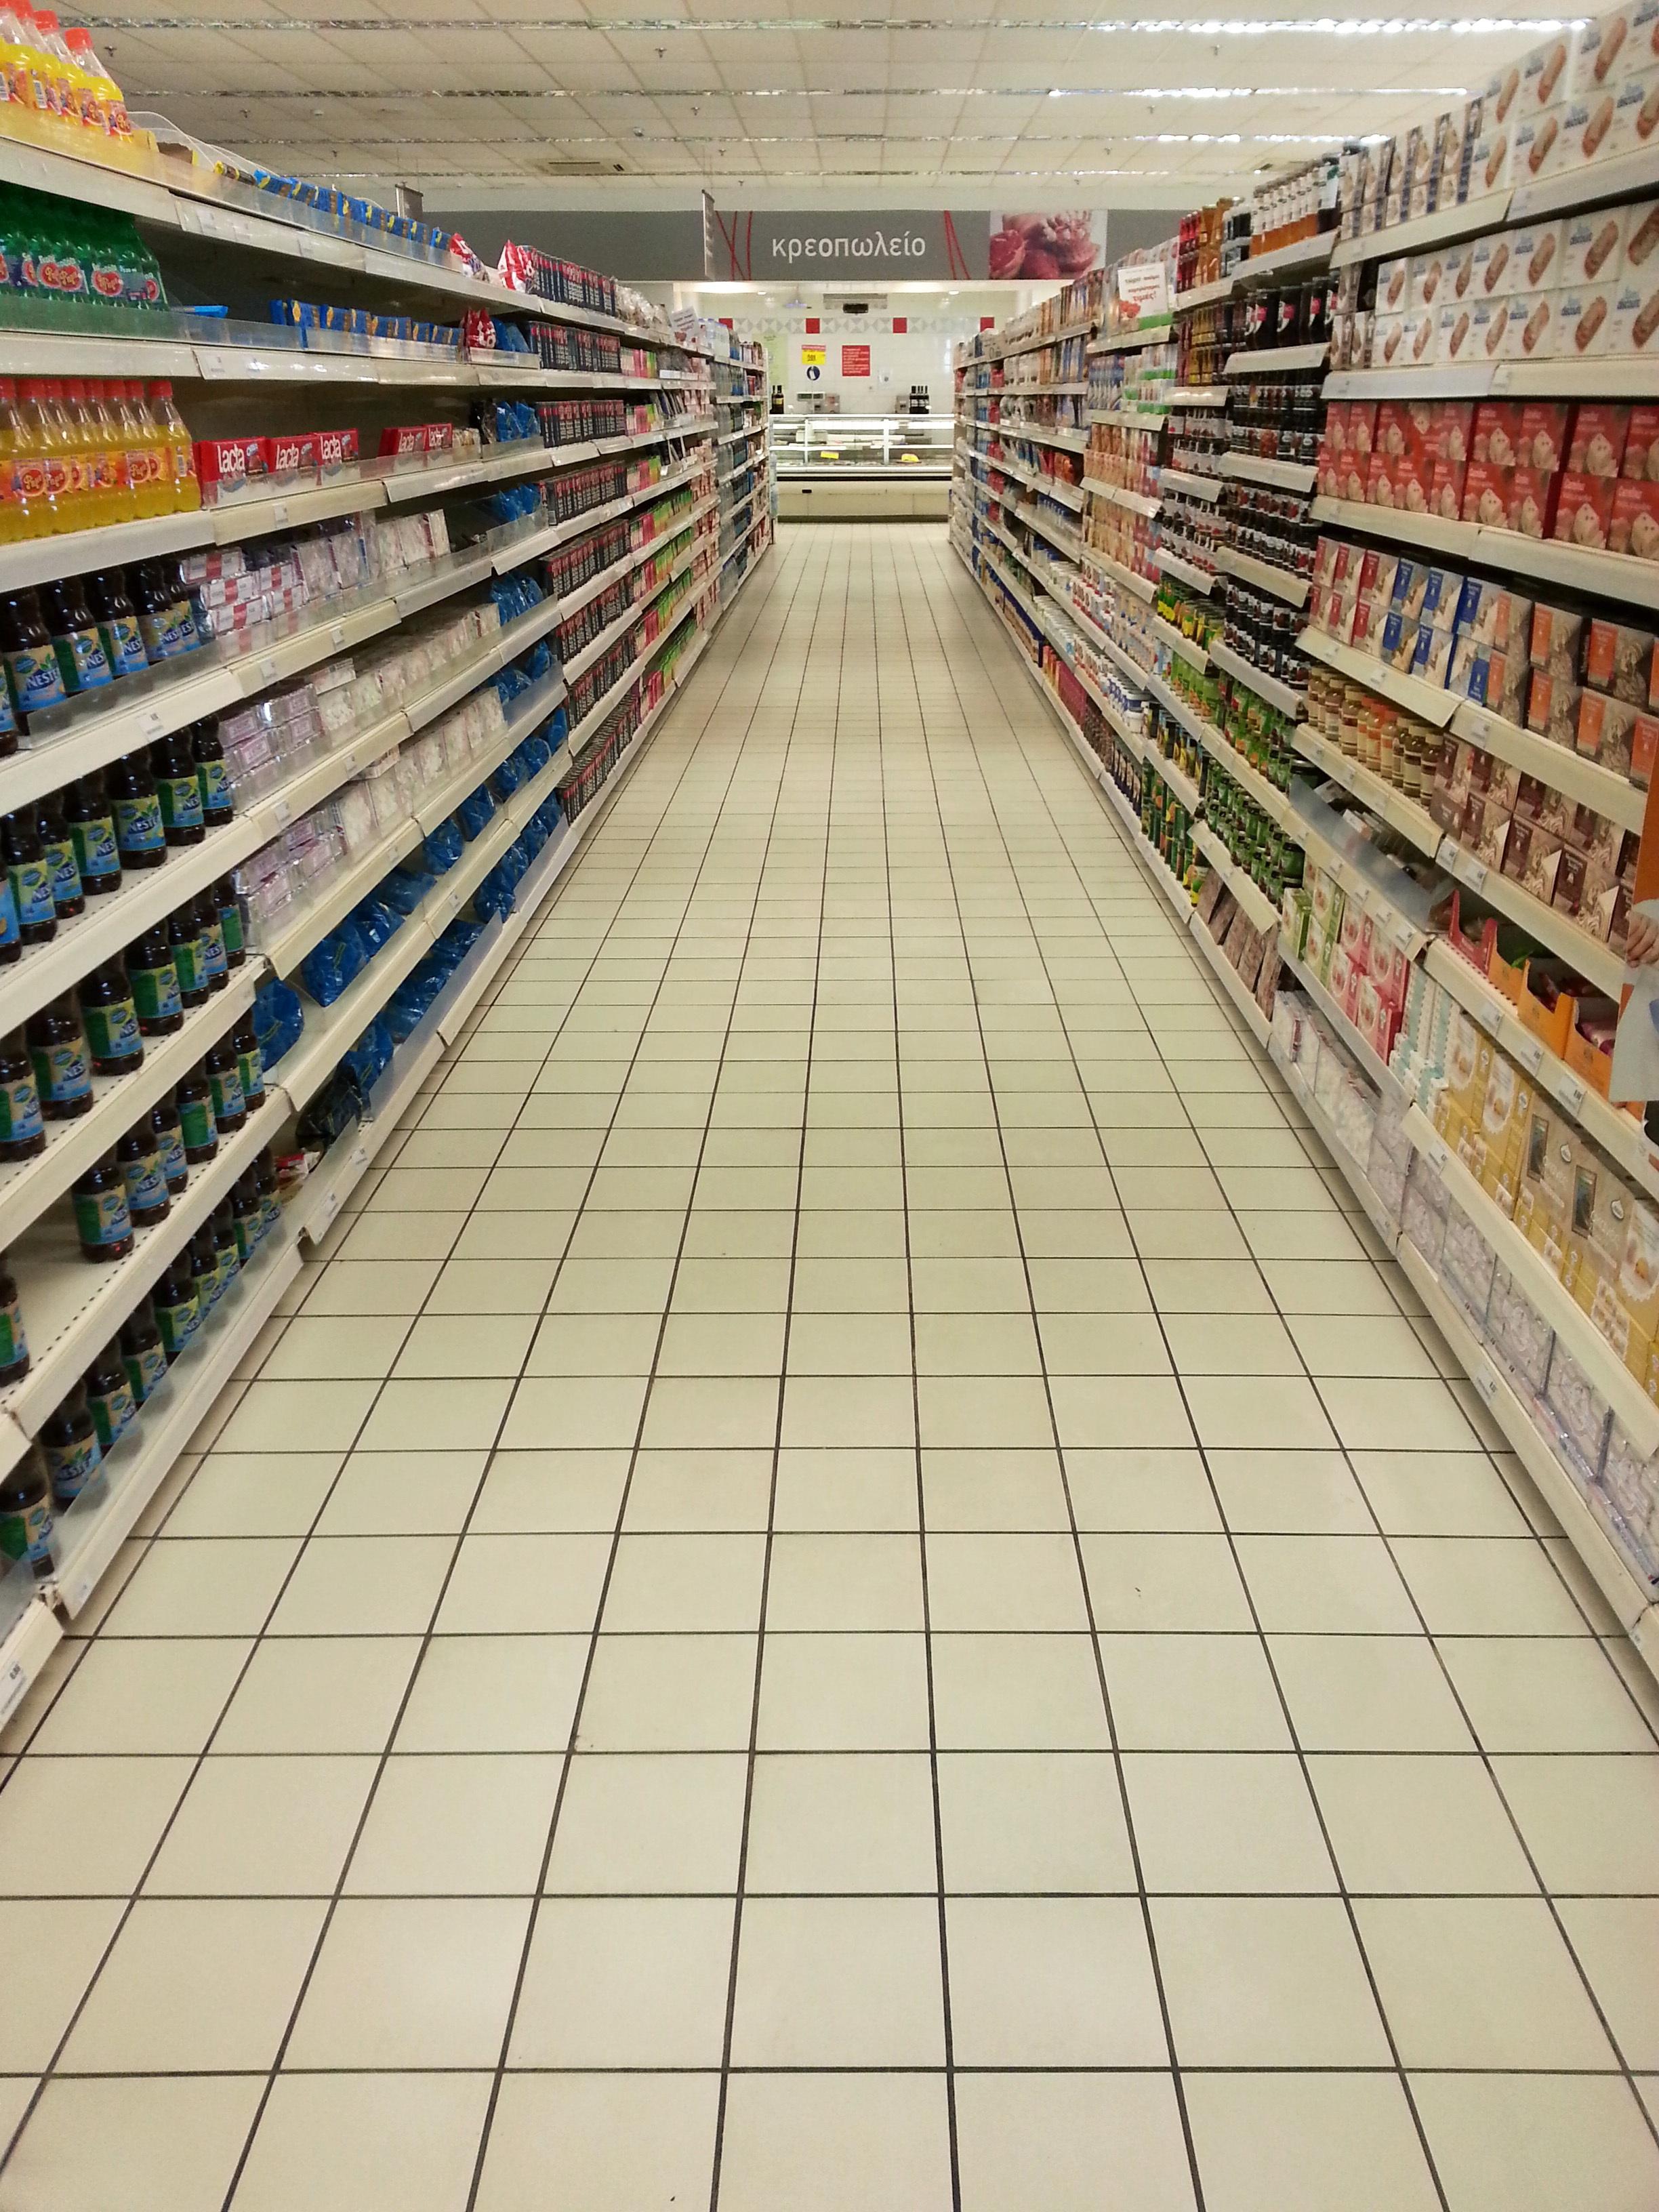 Free Images : structure, floor, building, tile, empty, business ...